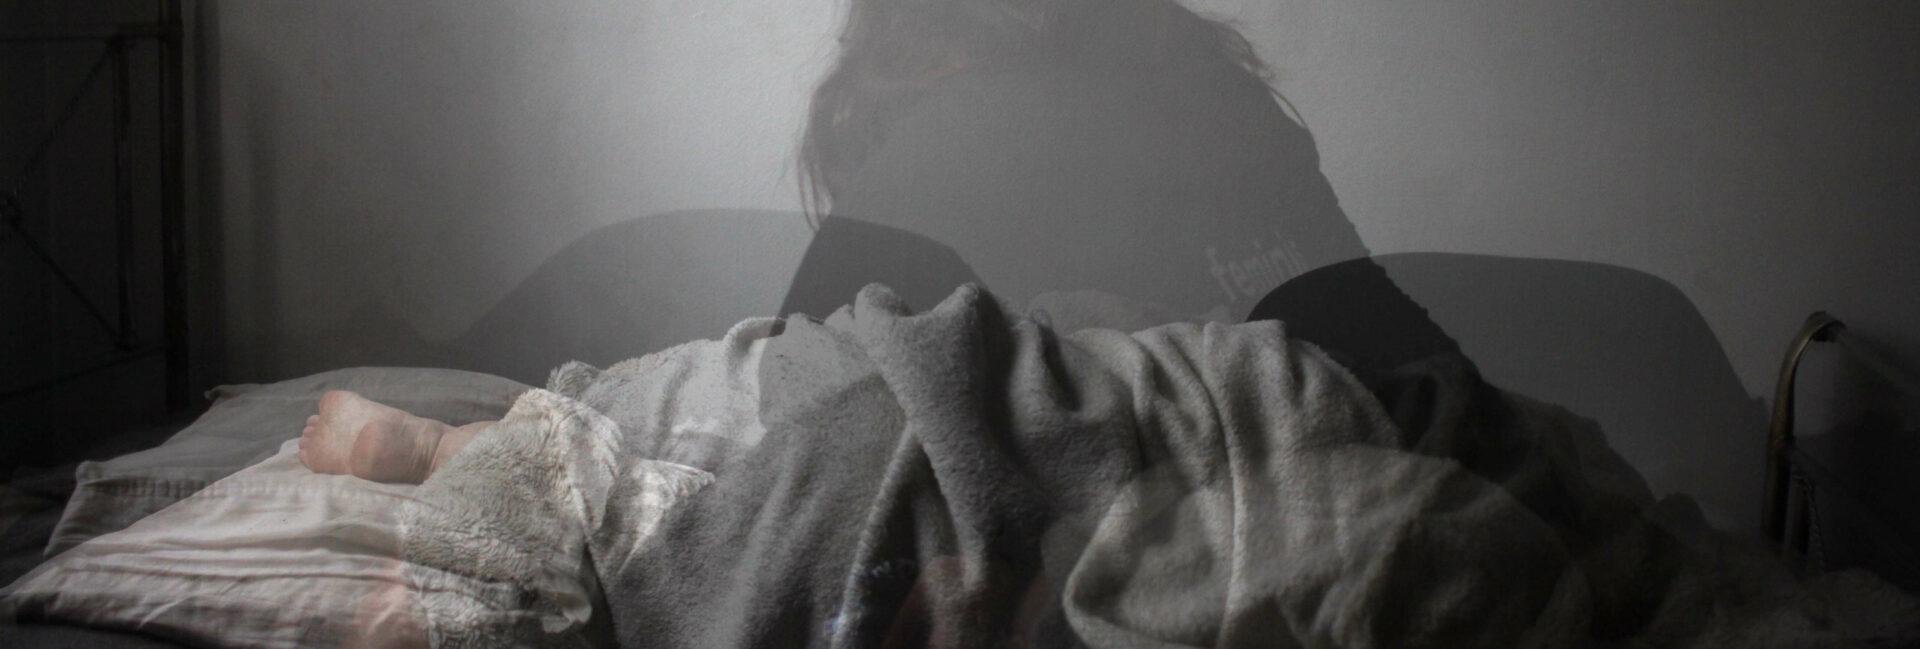 slapeloosheid na bevalling